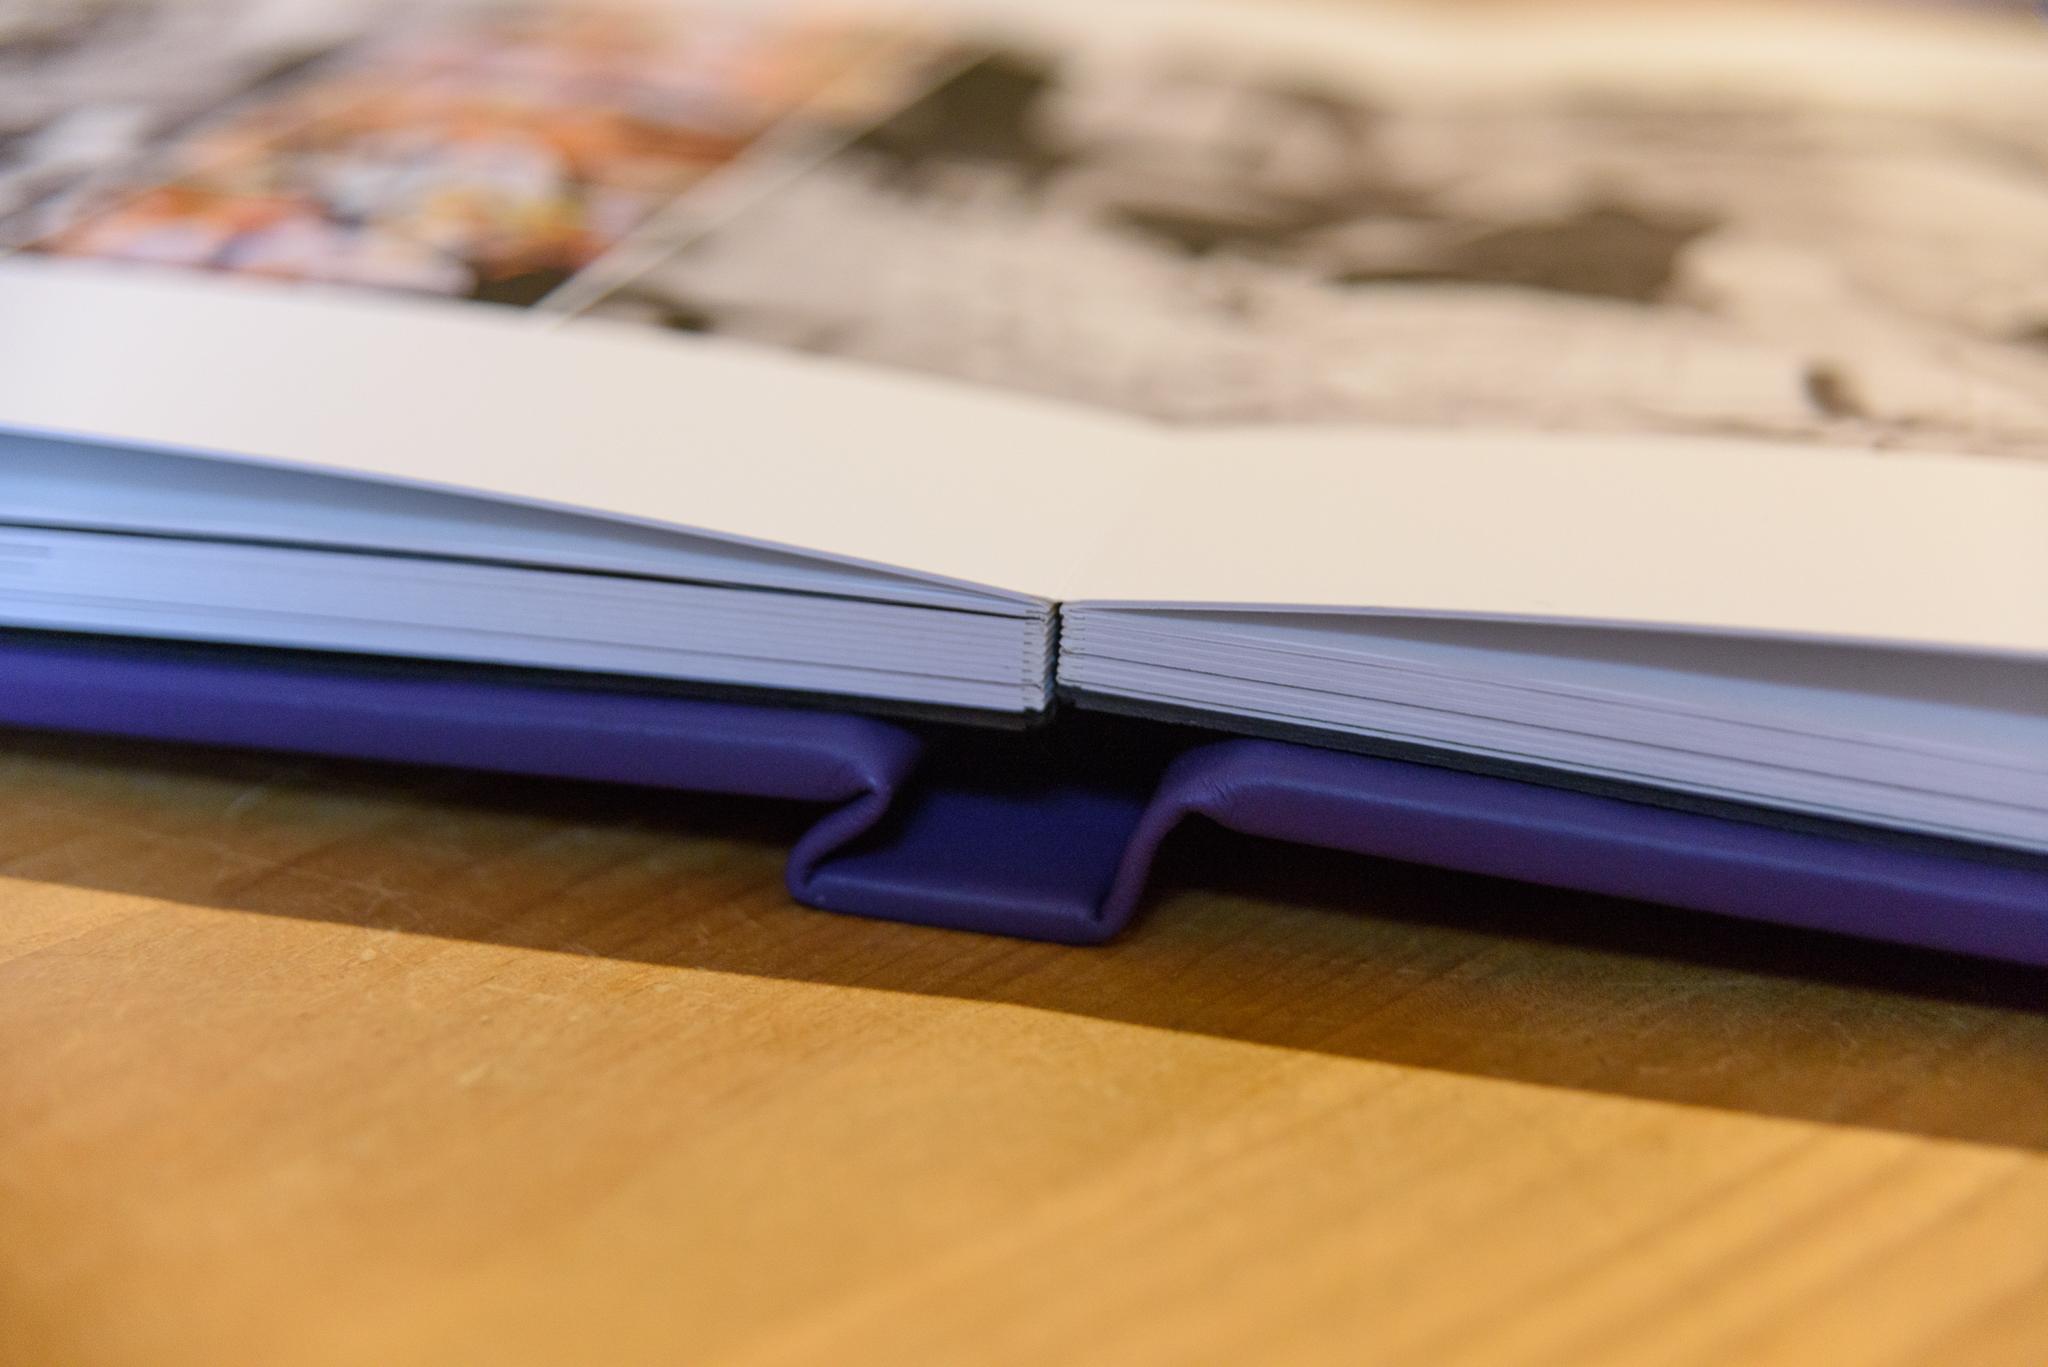 wedding album spine with purple cover